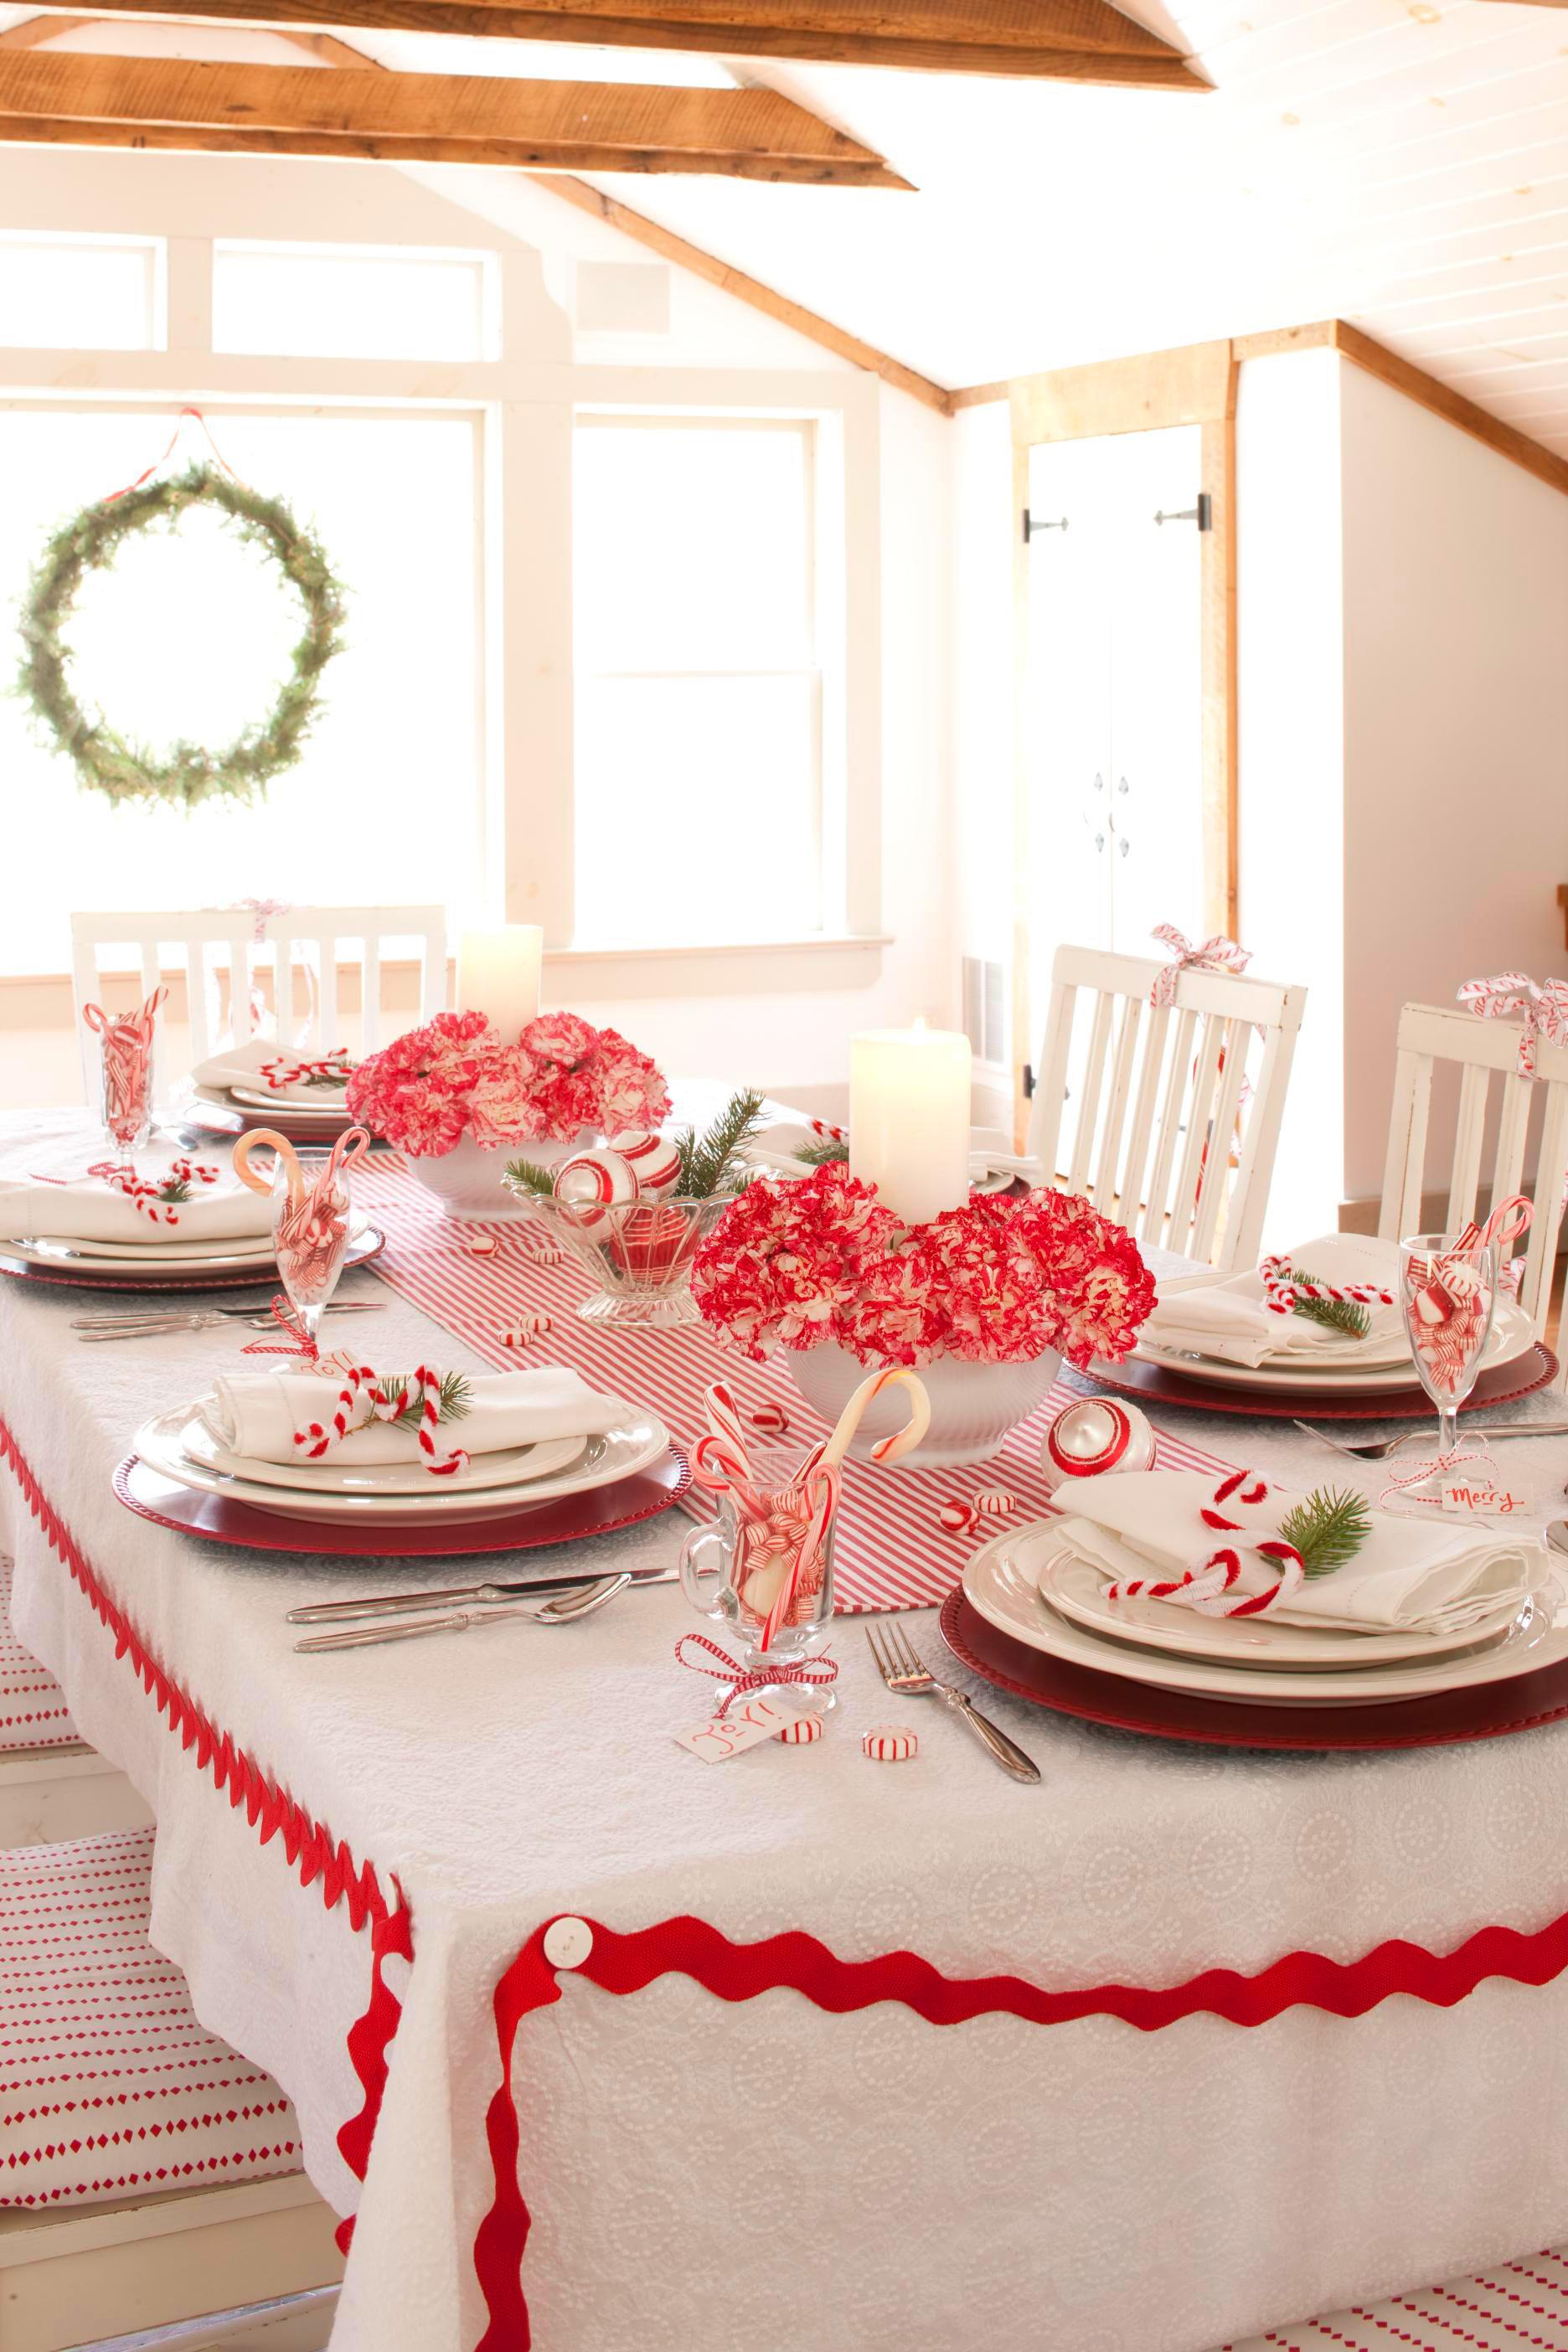 Christmas centerpiece ideas: carnations